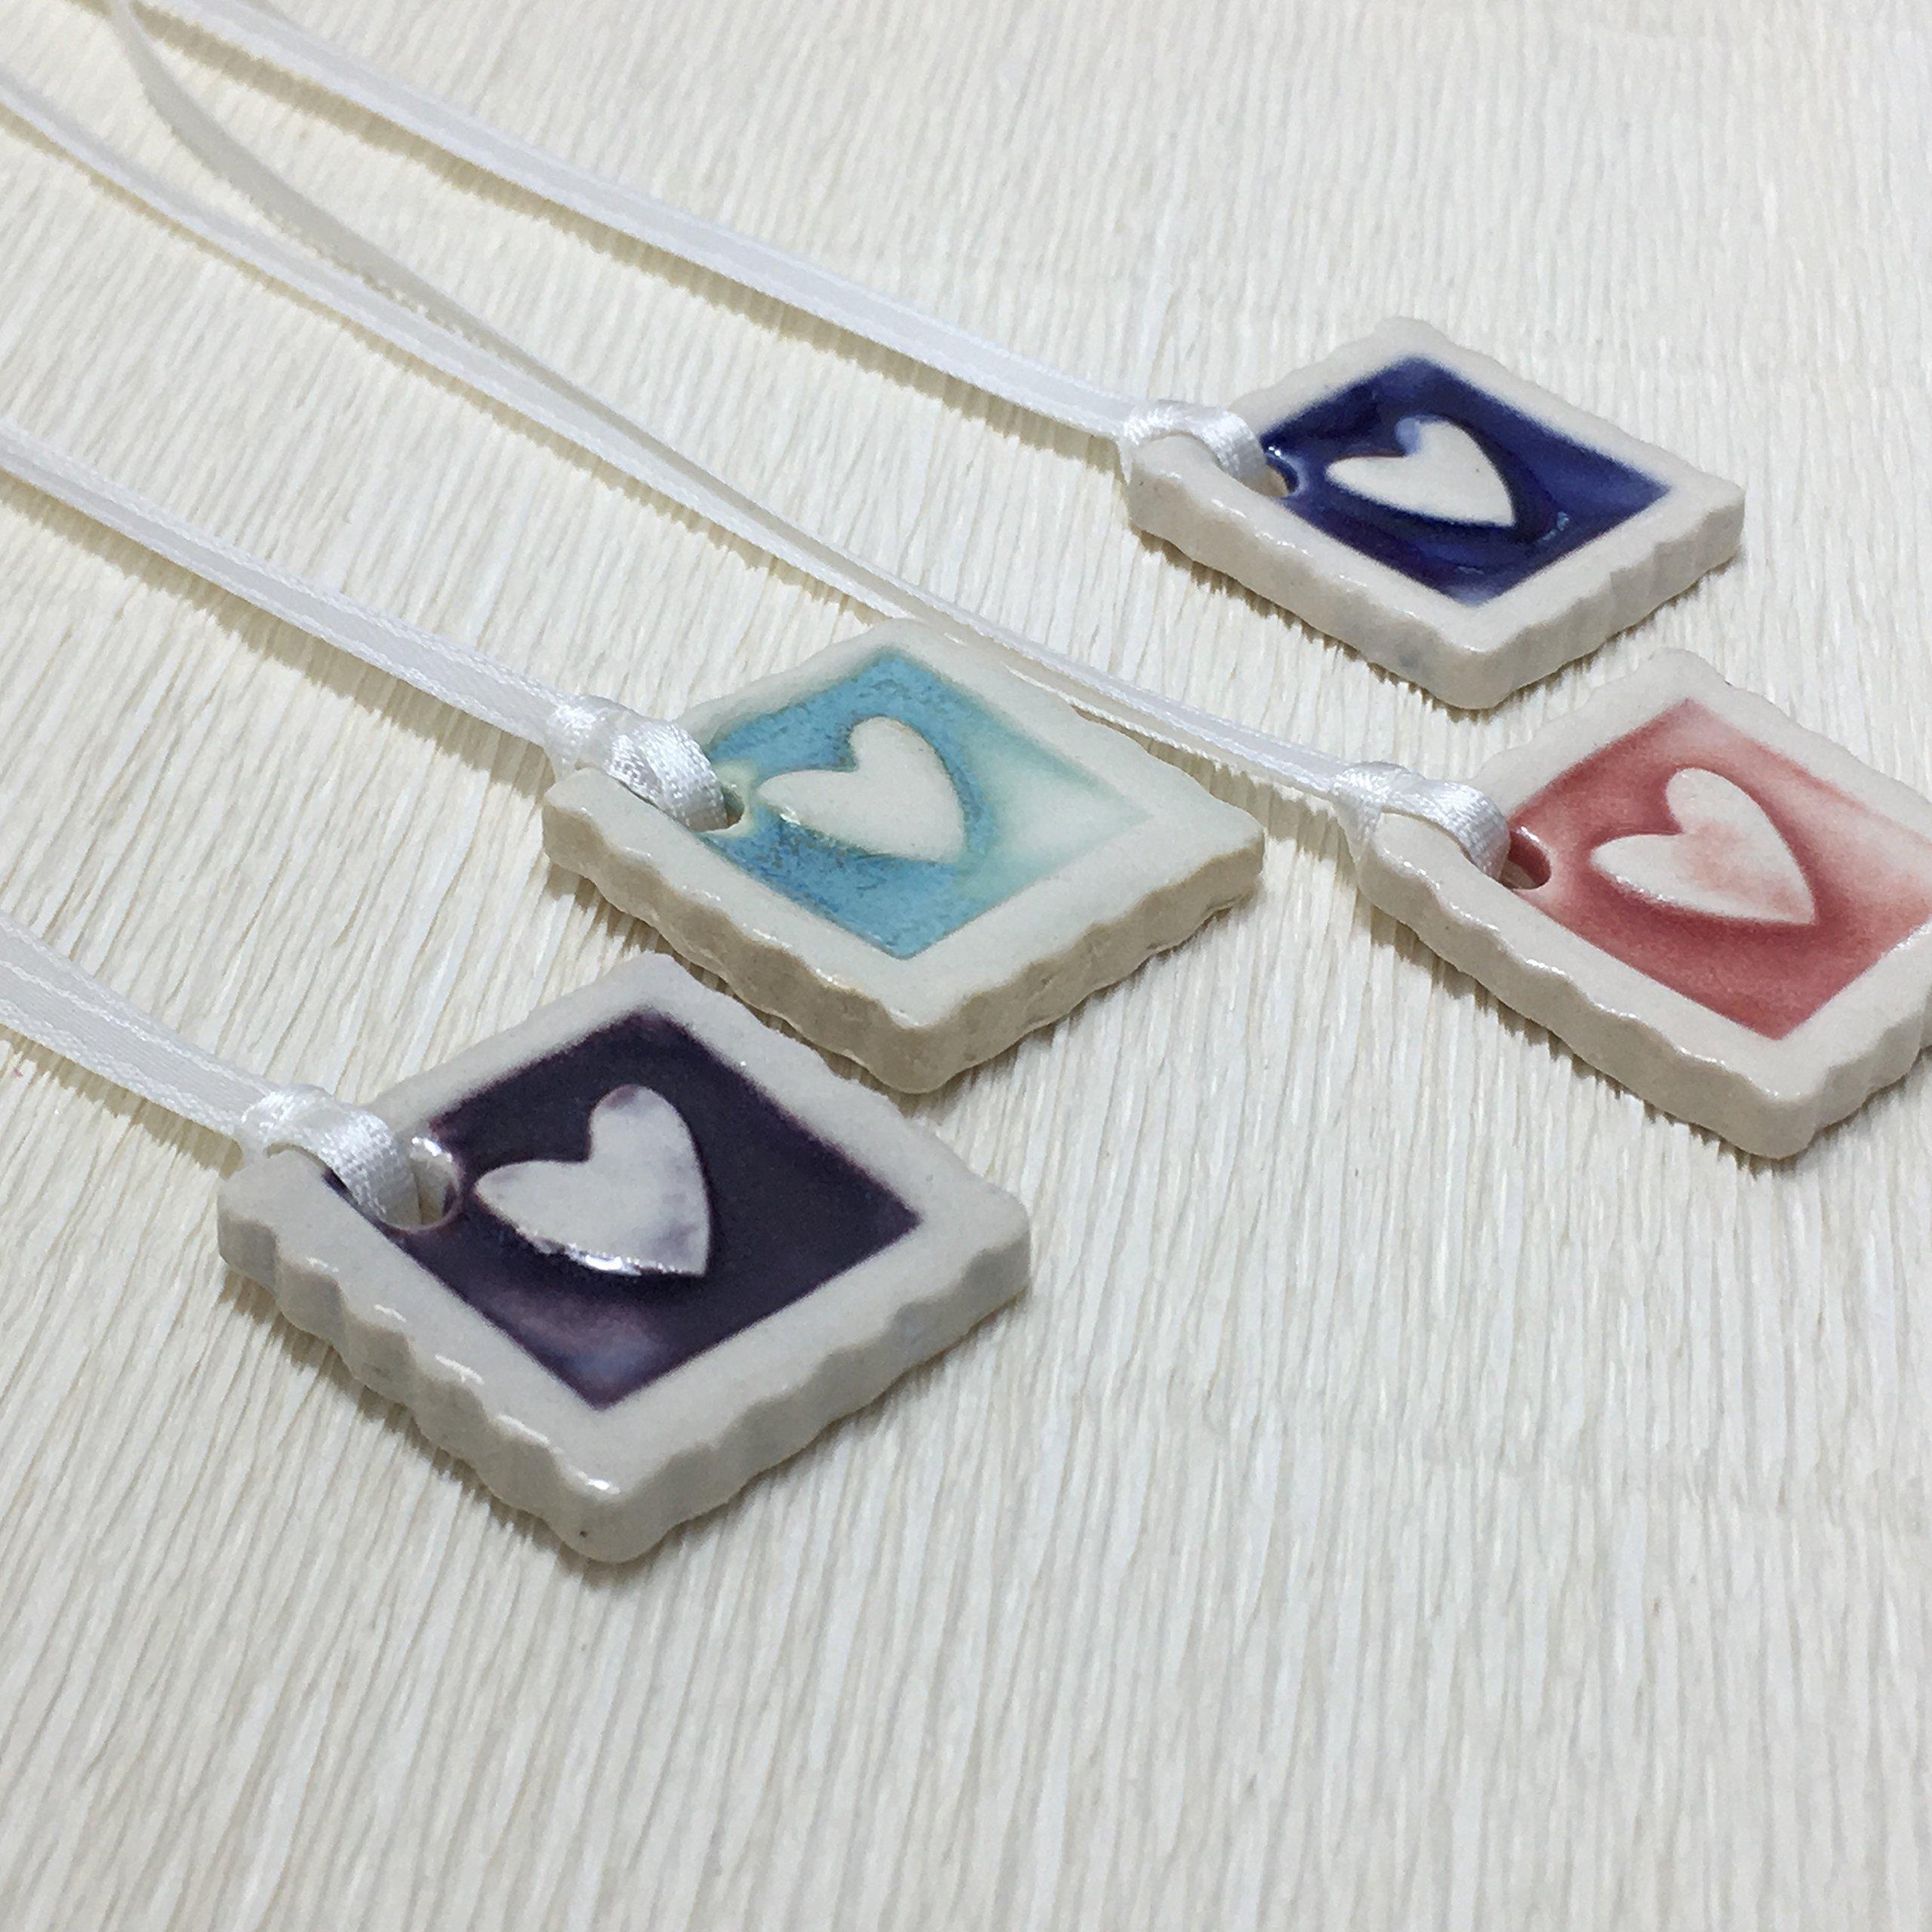 JANECKA Square Heart 1'' (Set of 4) Ornament/Essential Oil Diffuser/Pottery 9th Anniversary Gift